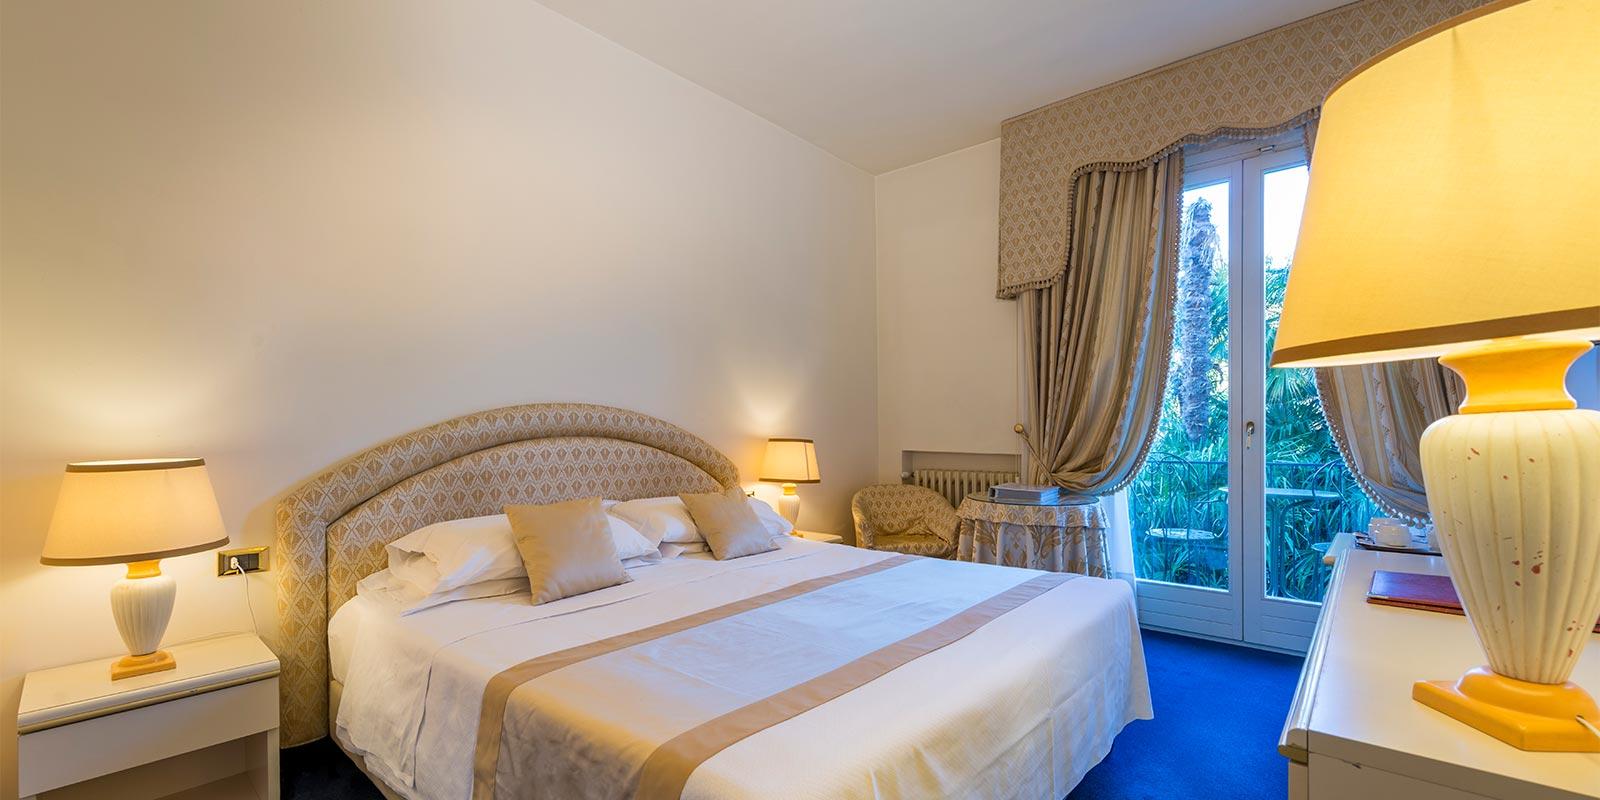 Hotel in Bardolino 3 Sterne – HOTEL 4 STAGIONI